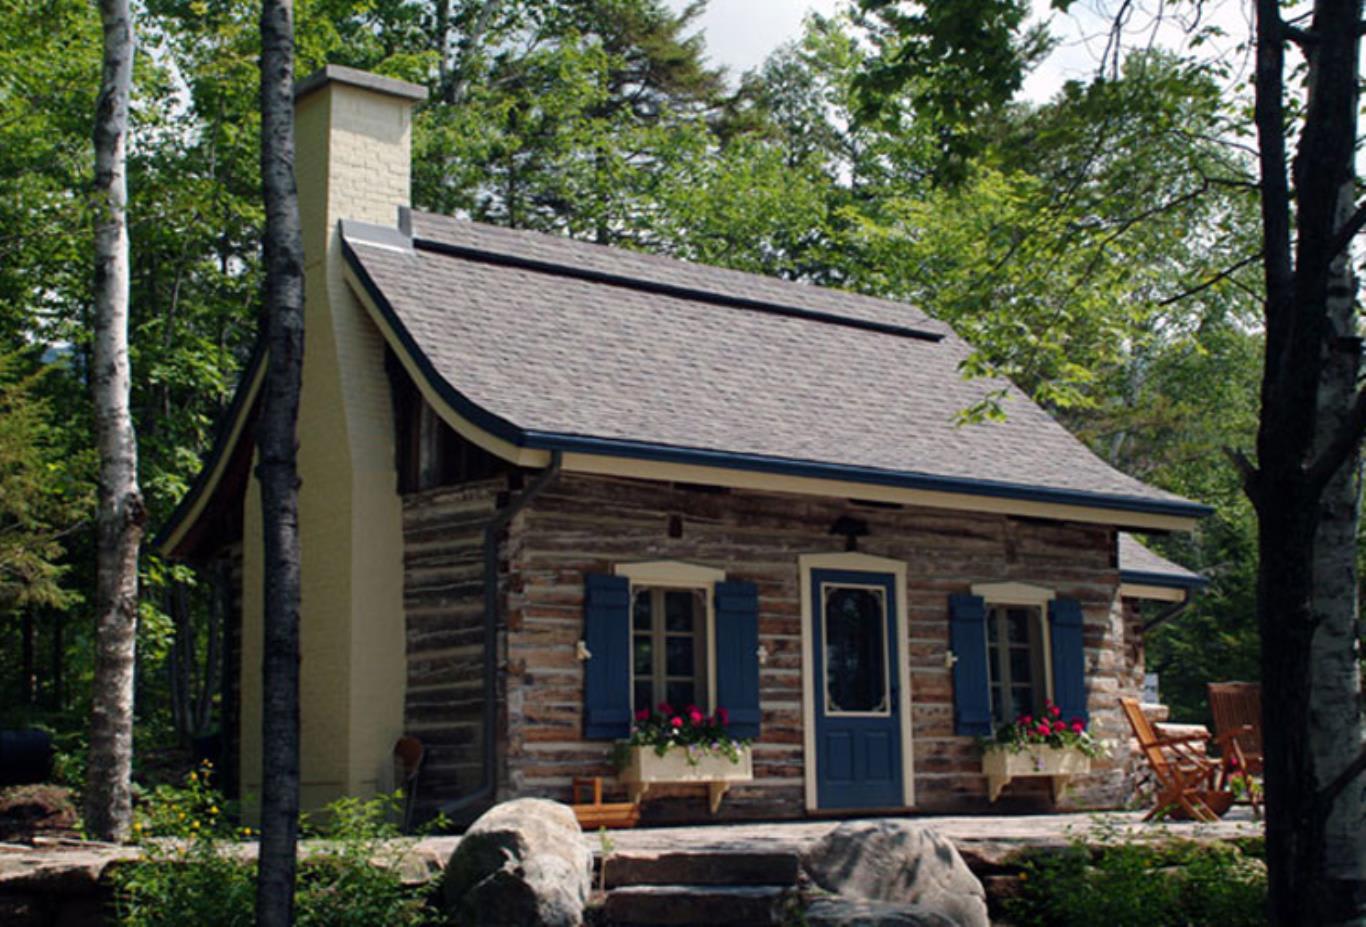 Clagetts Cabin